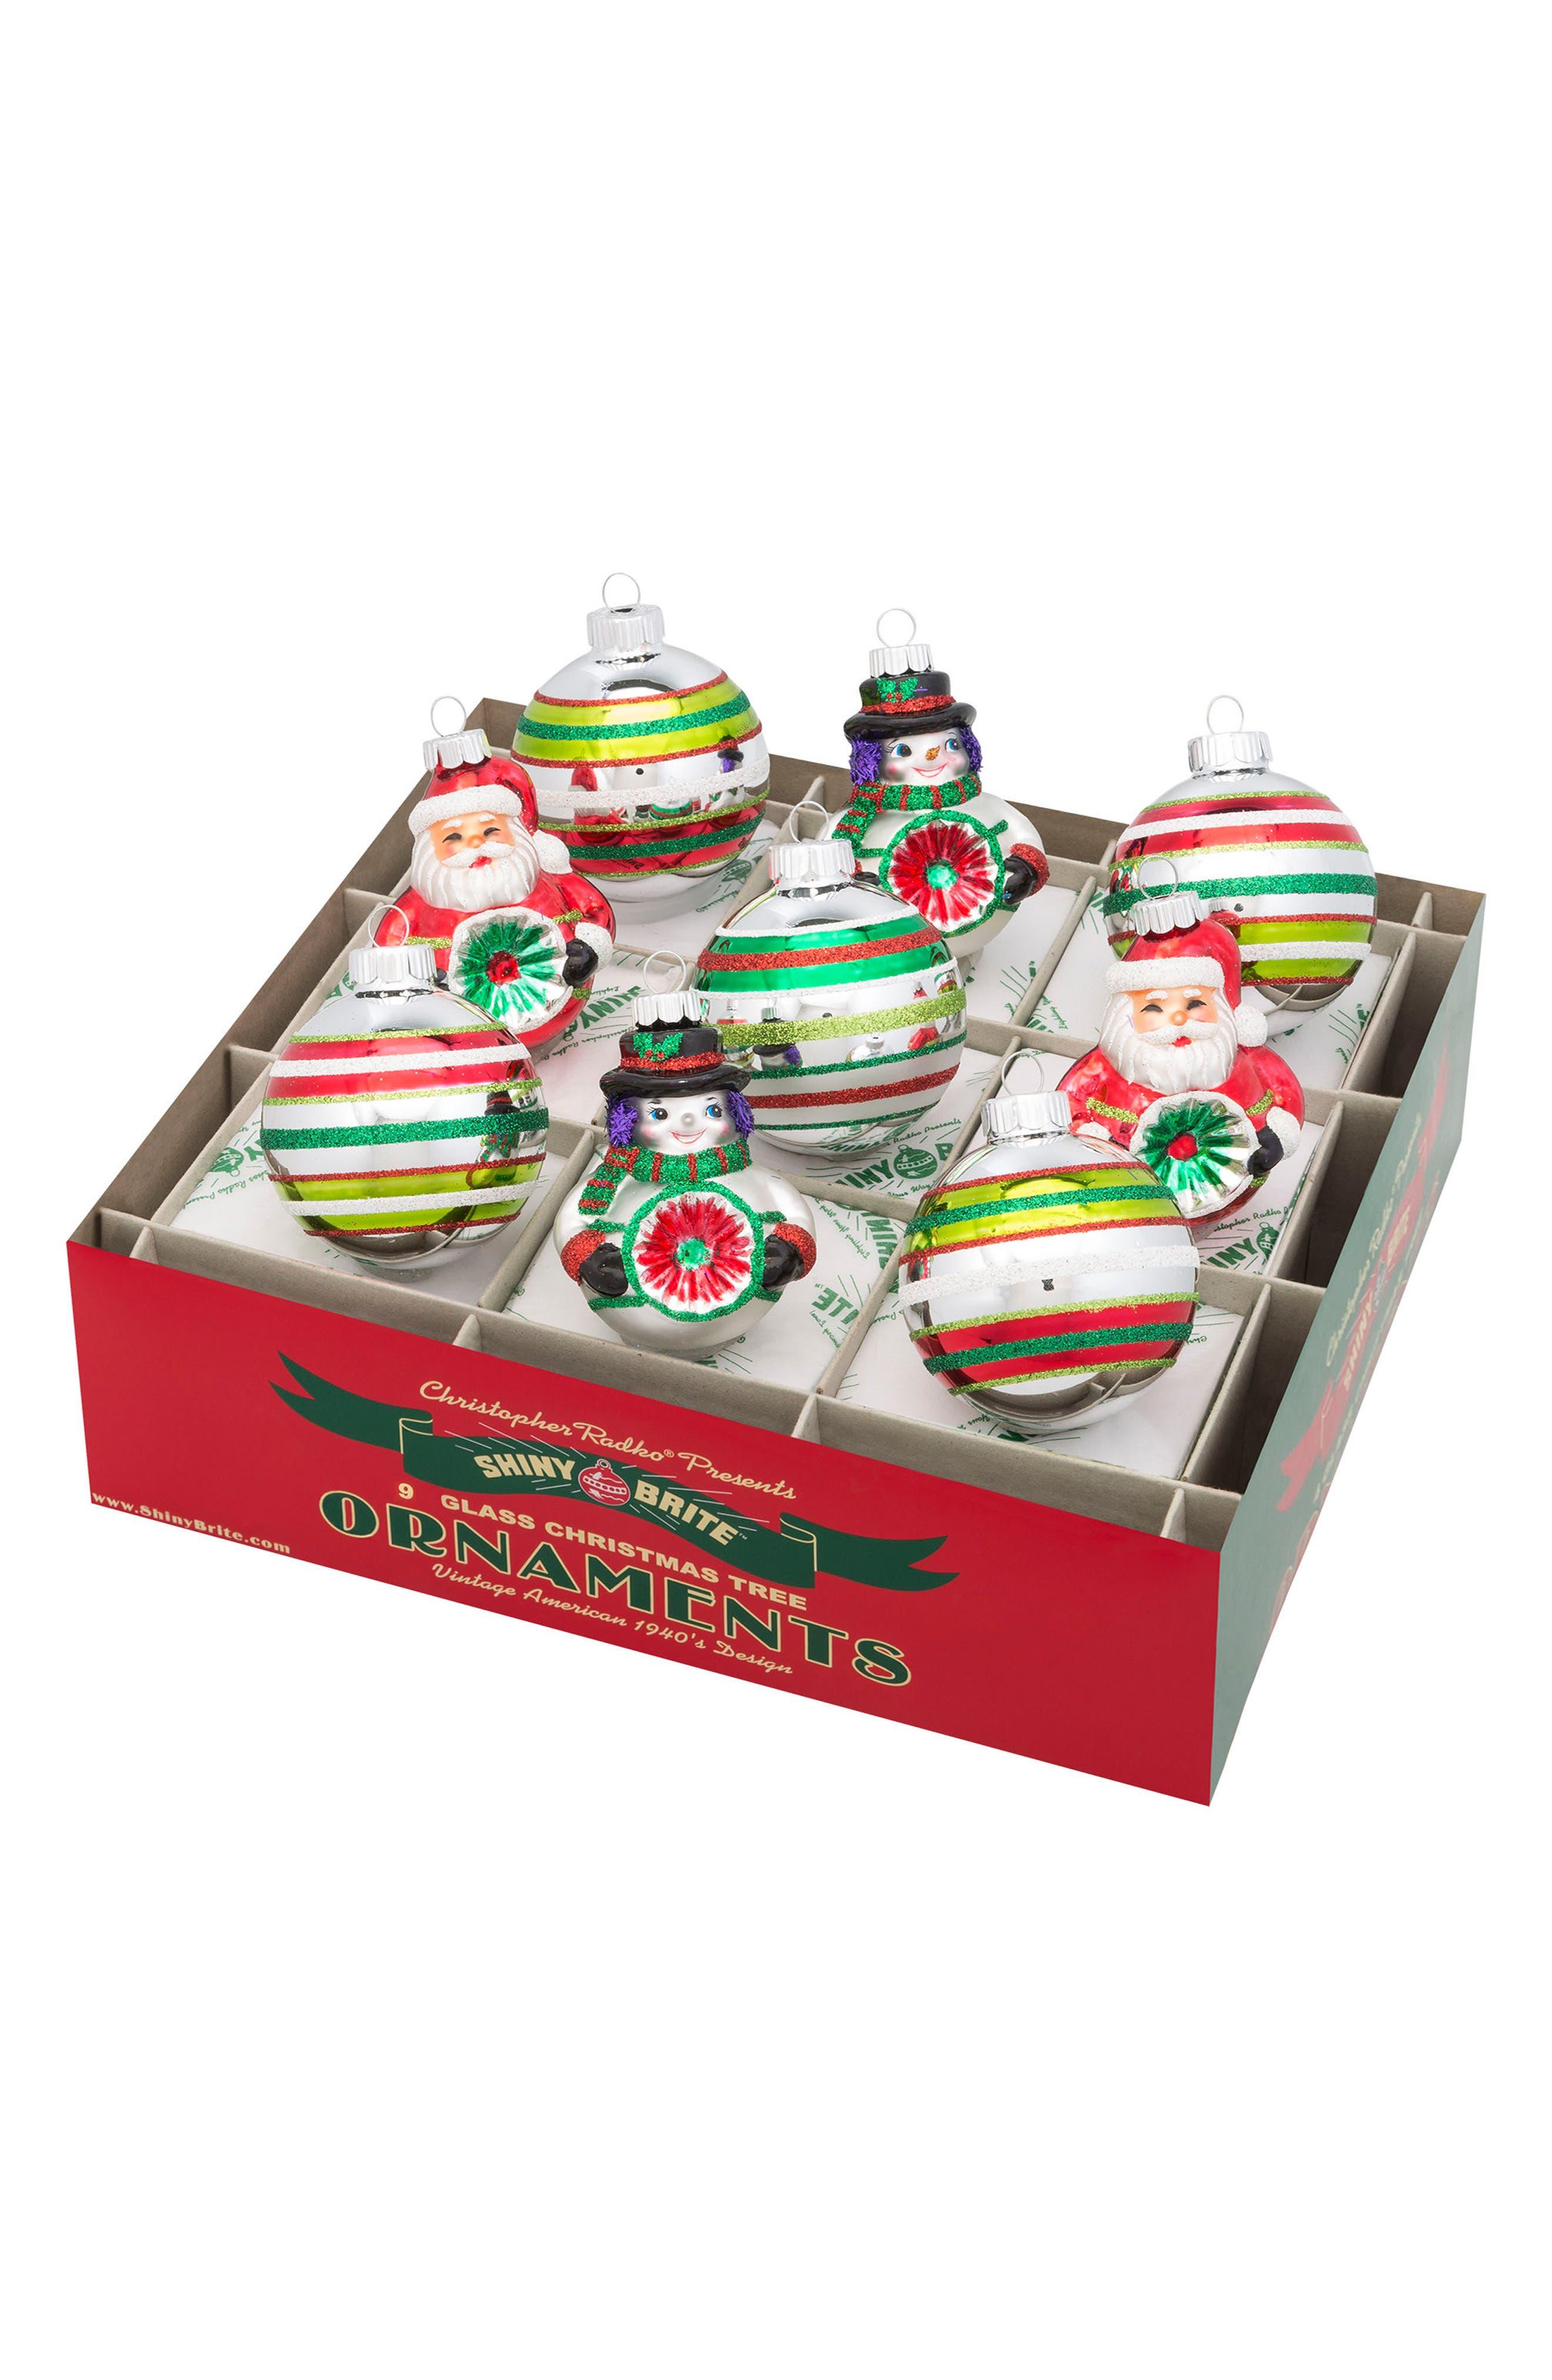 Main Image - Christopher Radko Holiday Splendor Set of 9 Glass Ornaments